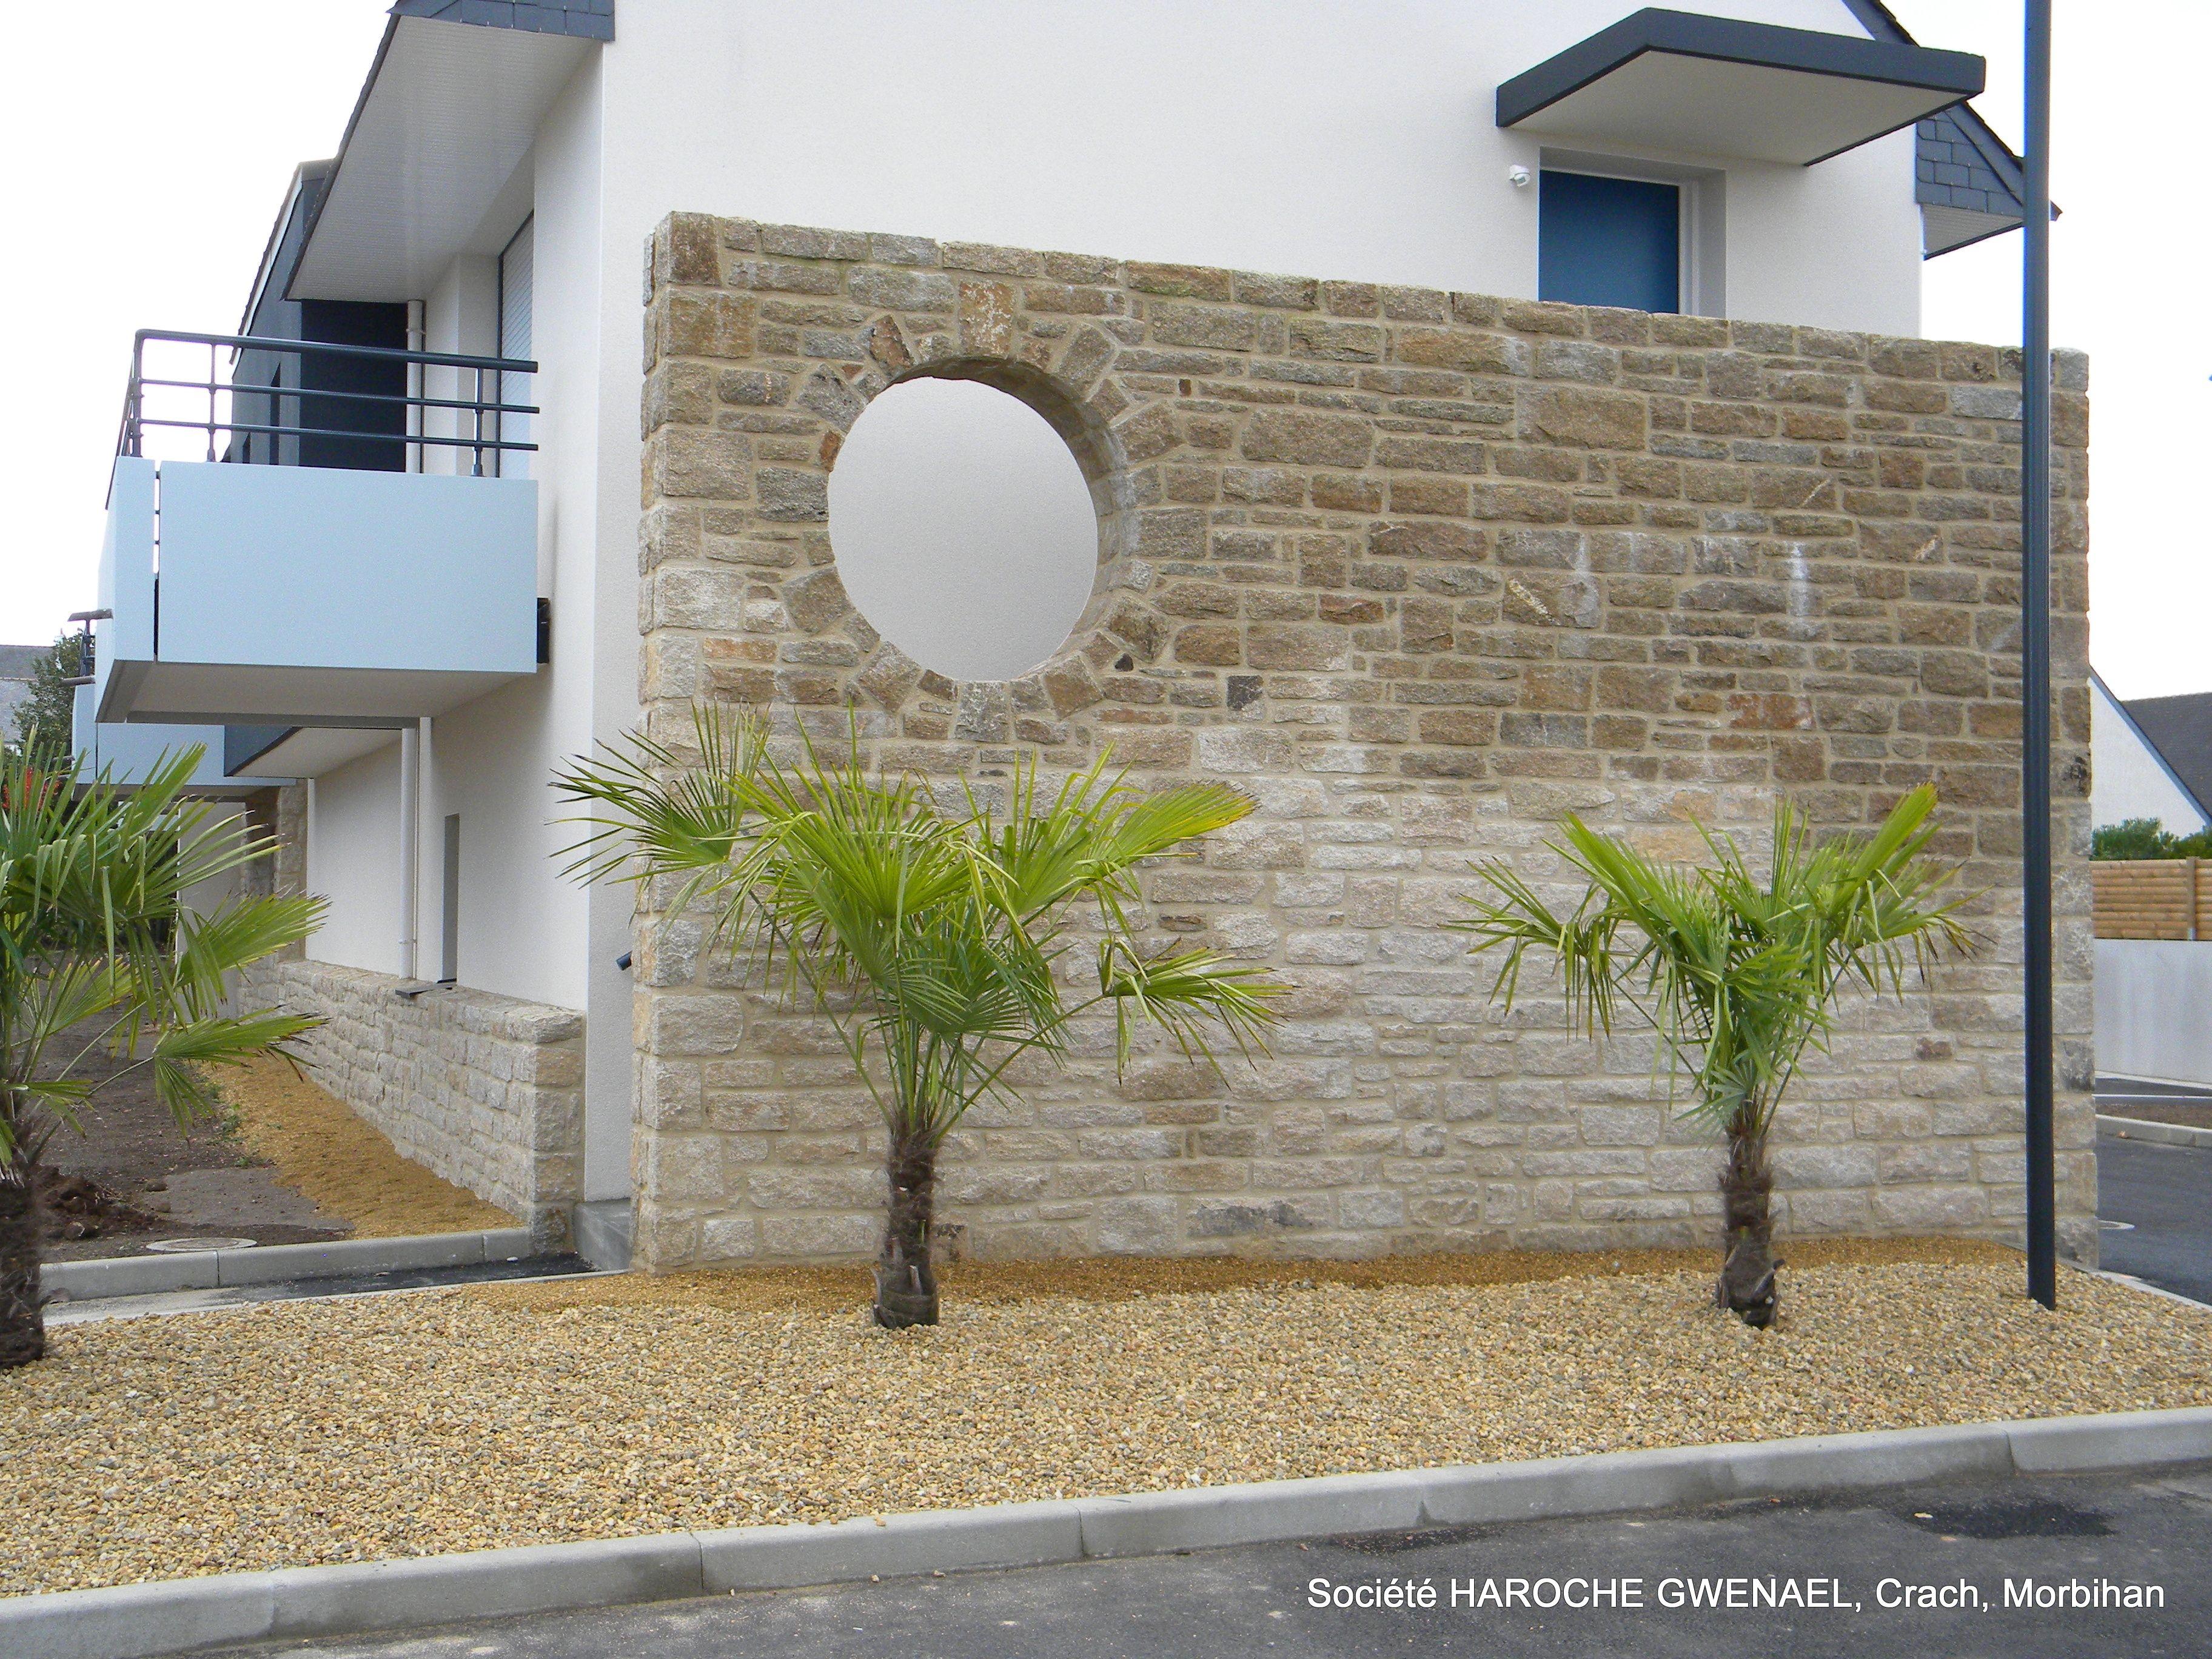 mur en pierre naturelle d 39 elven avec un oeil de boeuf bull 39 s eye window soci t haroche. Black Bedroom Furniture Sets. Home Design Ideas